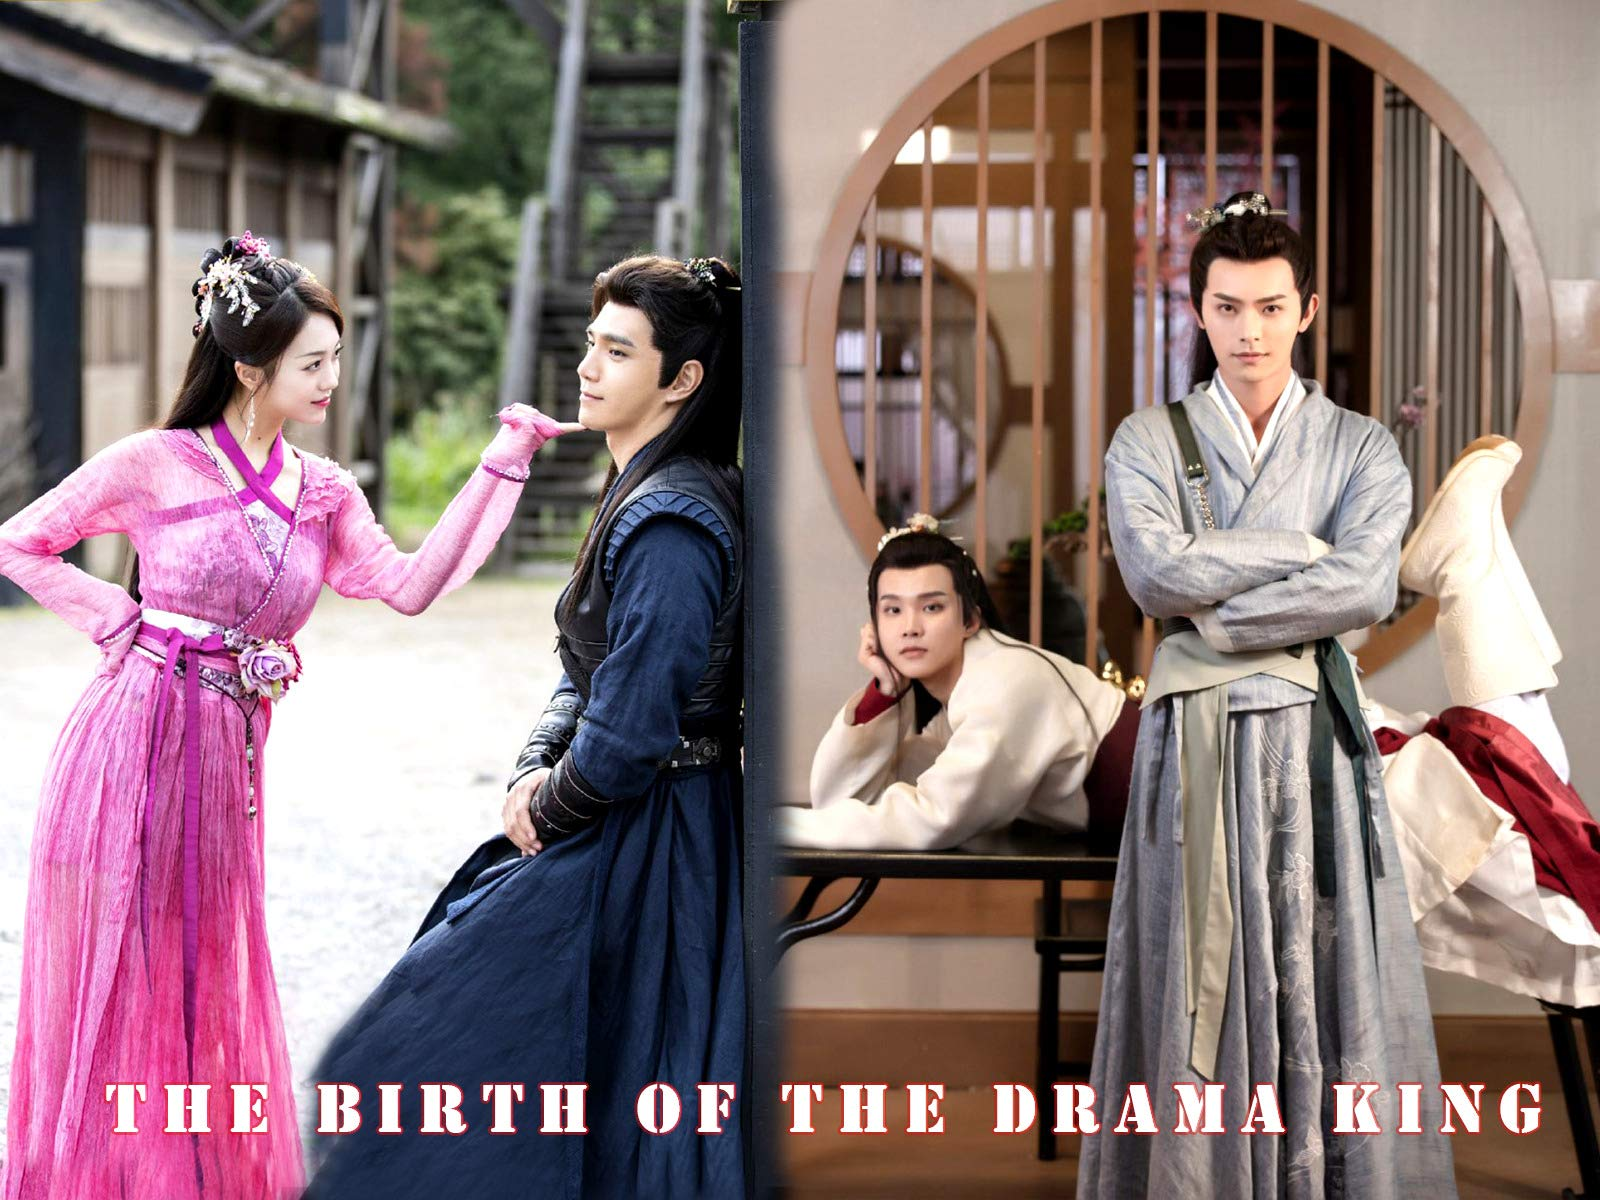 The Birth Of The Drama King - Season 1